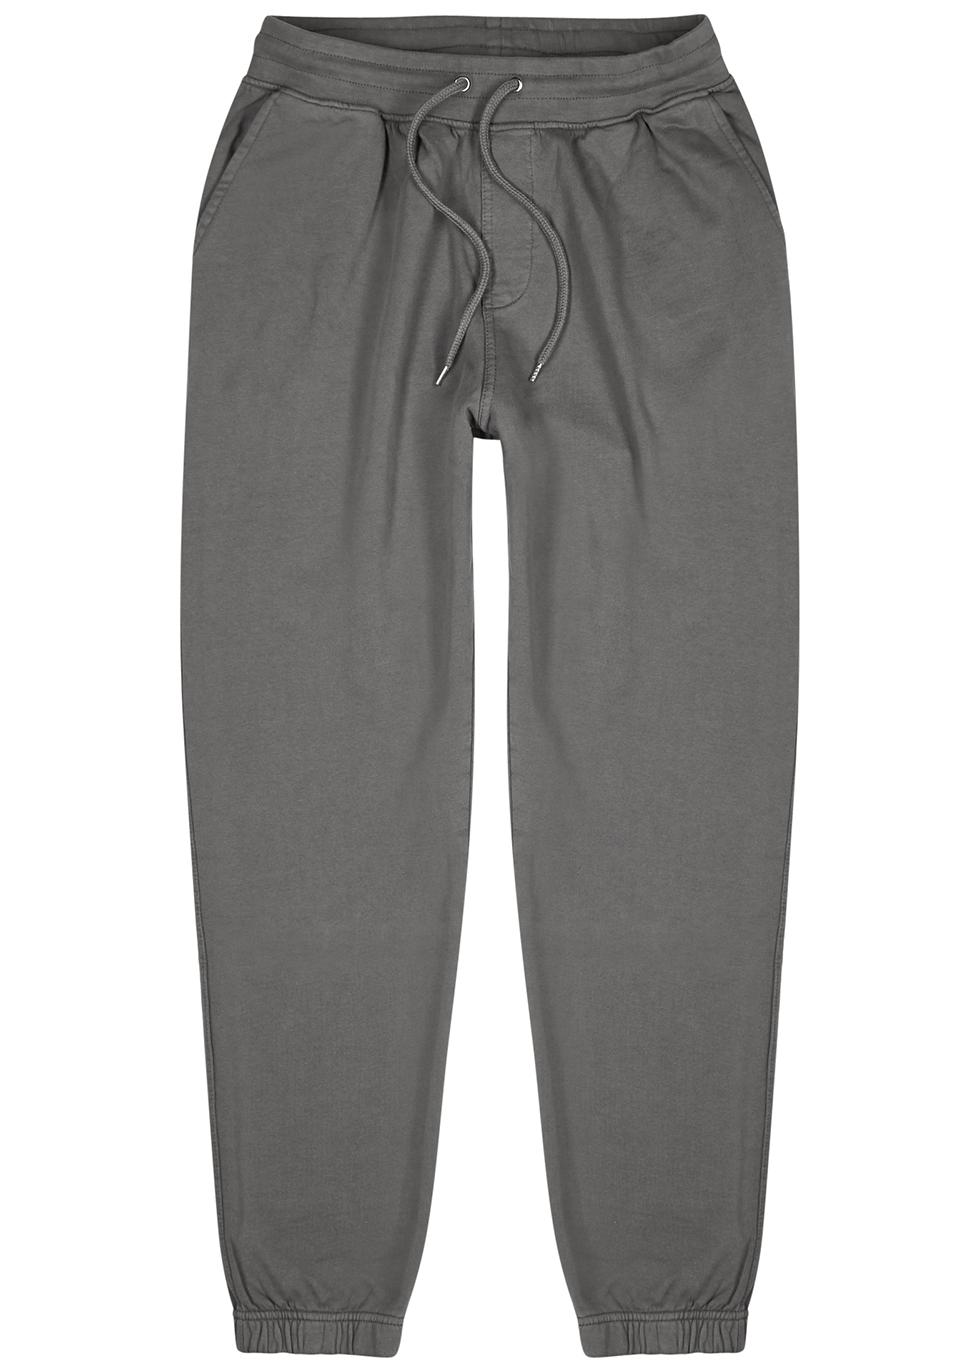 Grey cotton sweatpants